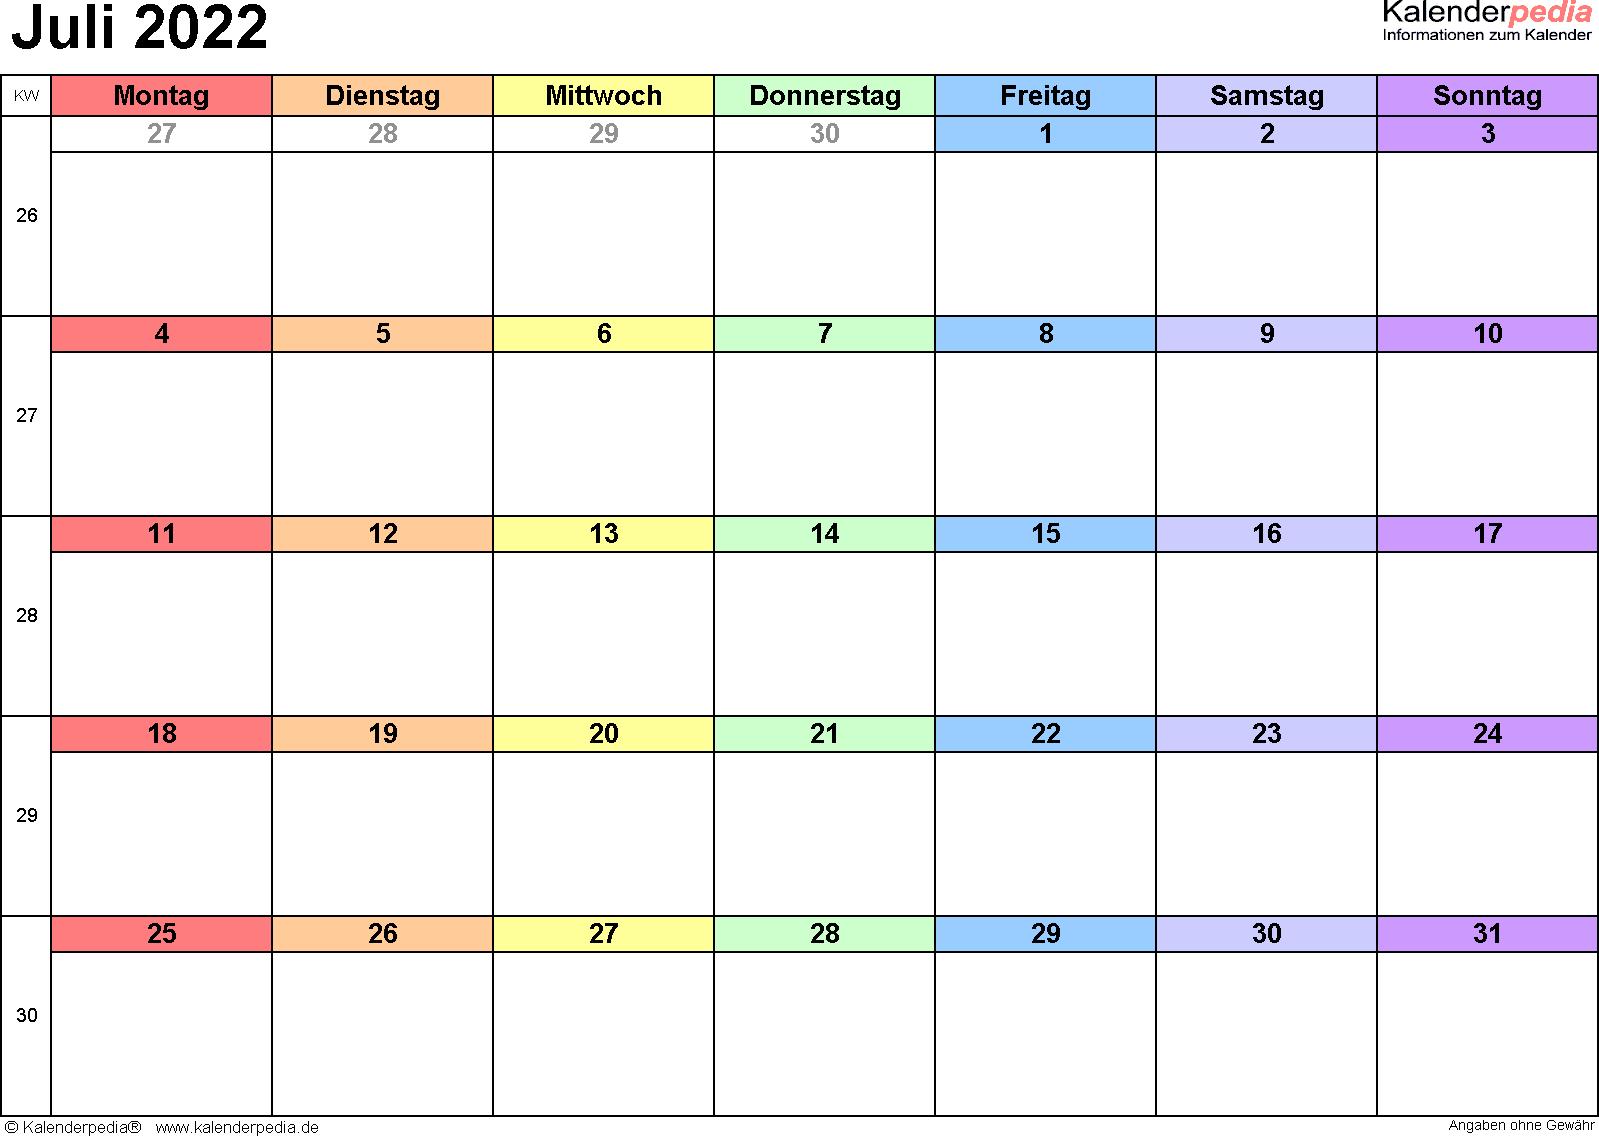 Kalender Juli 2022 (Querformat) als Excel-Vorlage